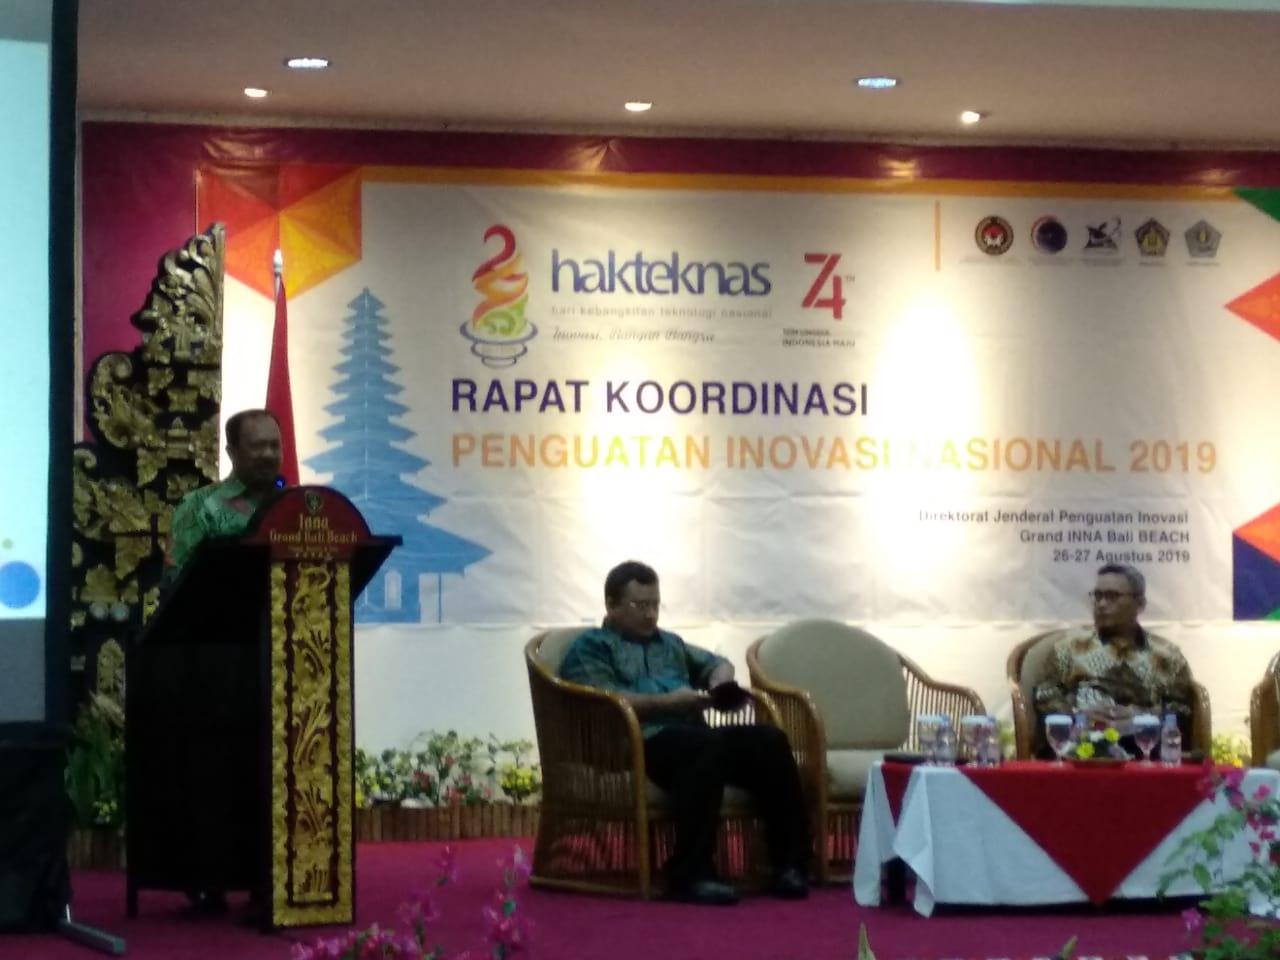 https: img-z.okeinfo.net content 2019 08 26 65 2096943 upaya-kemenristekdikti-dorong-percepatan-kemajuan-teknologi-di-indonesia-LO6m6CHTp0.jpeg